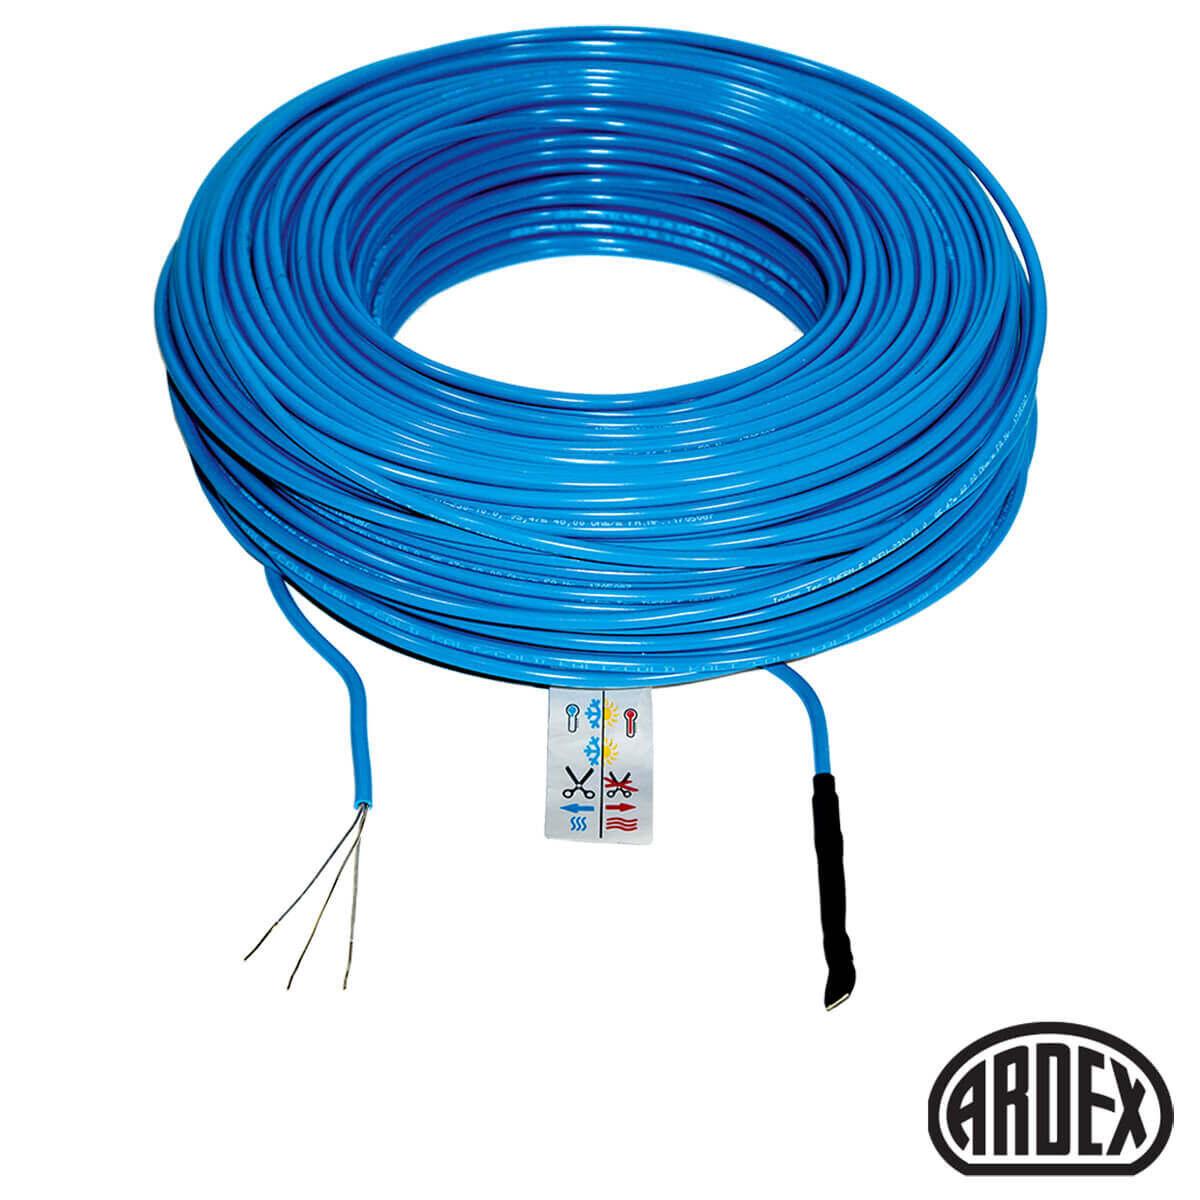 Ardex Flexbone Heat 120v Radiant Flooring Cable